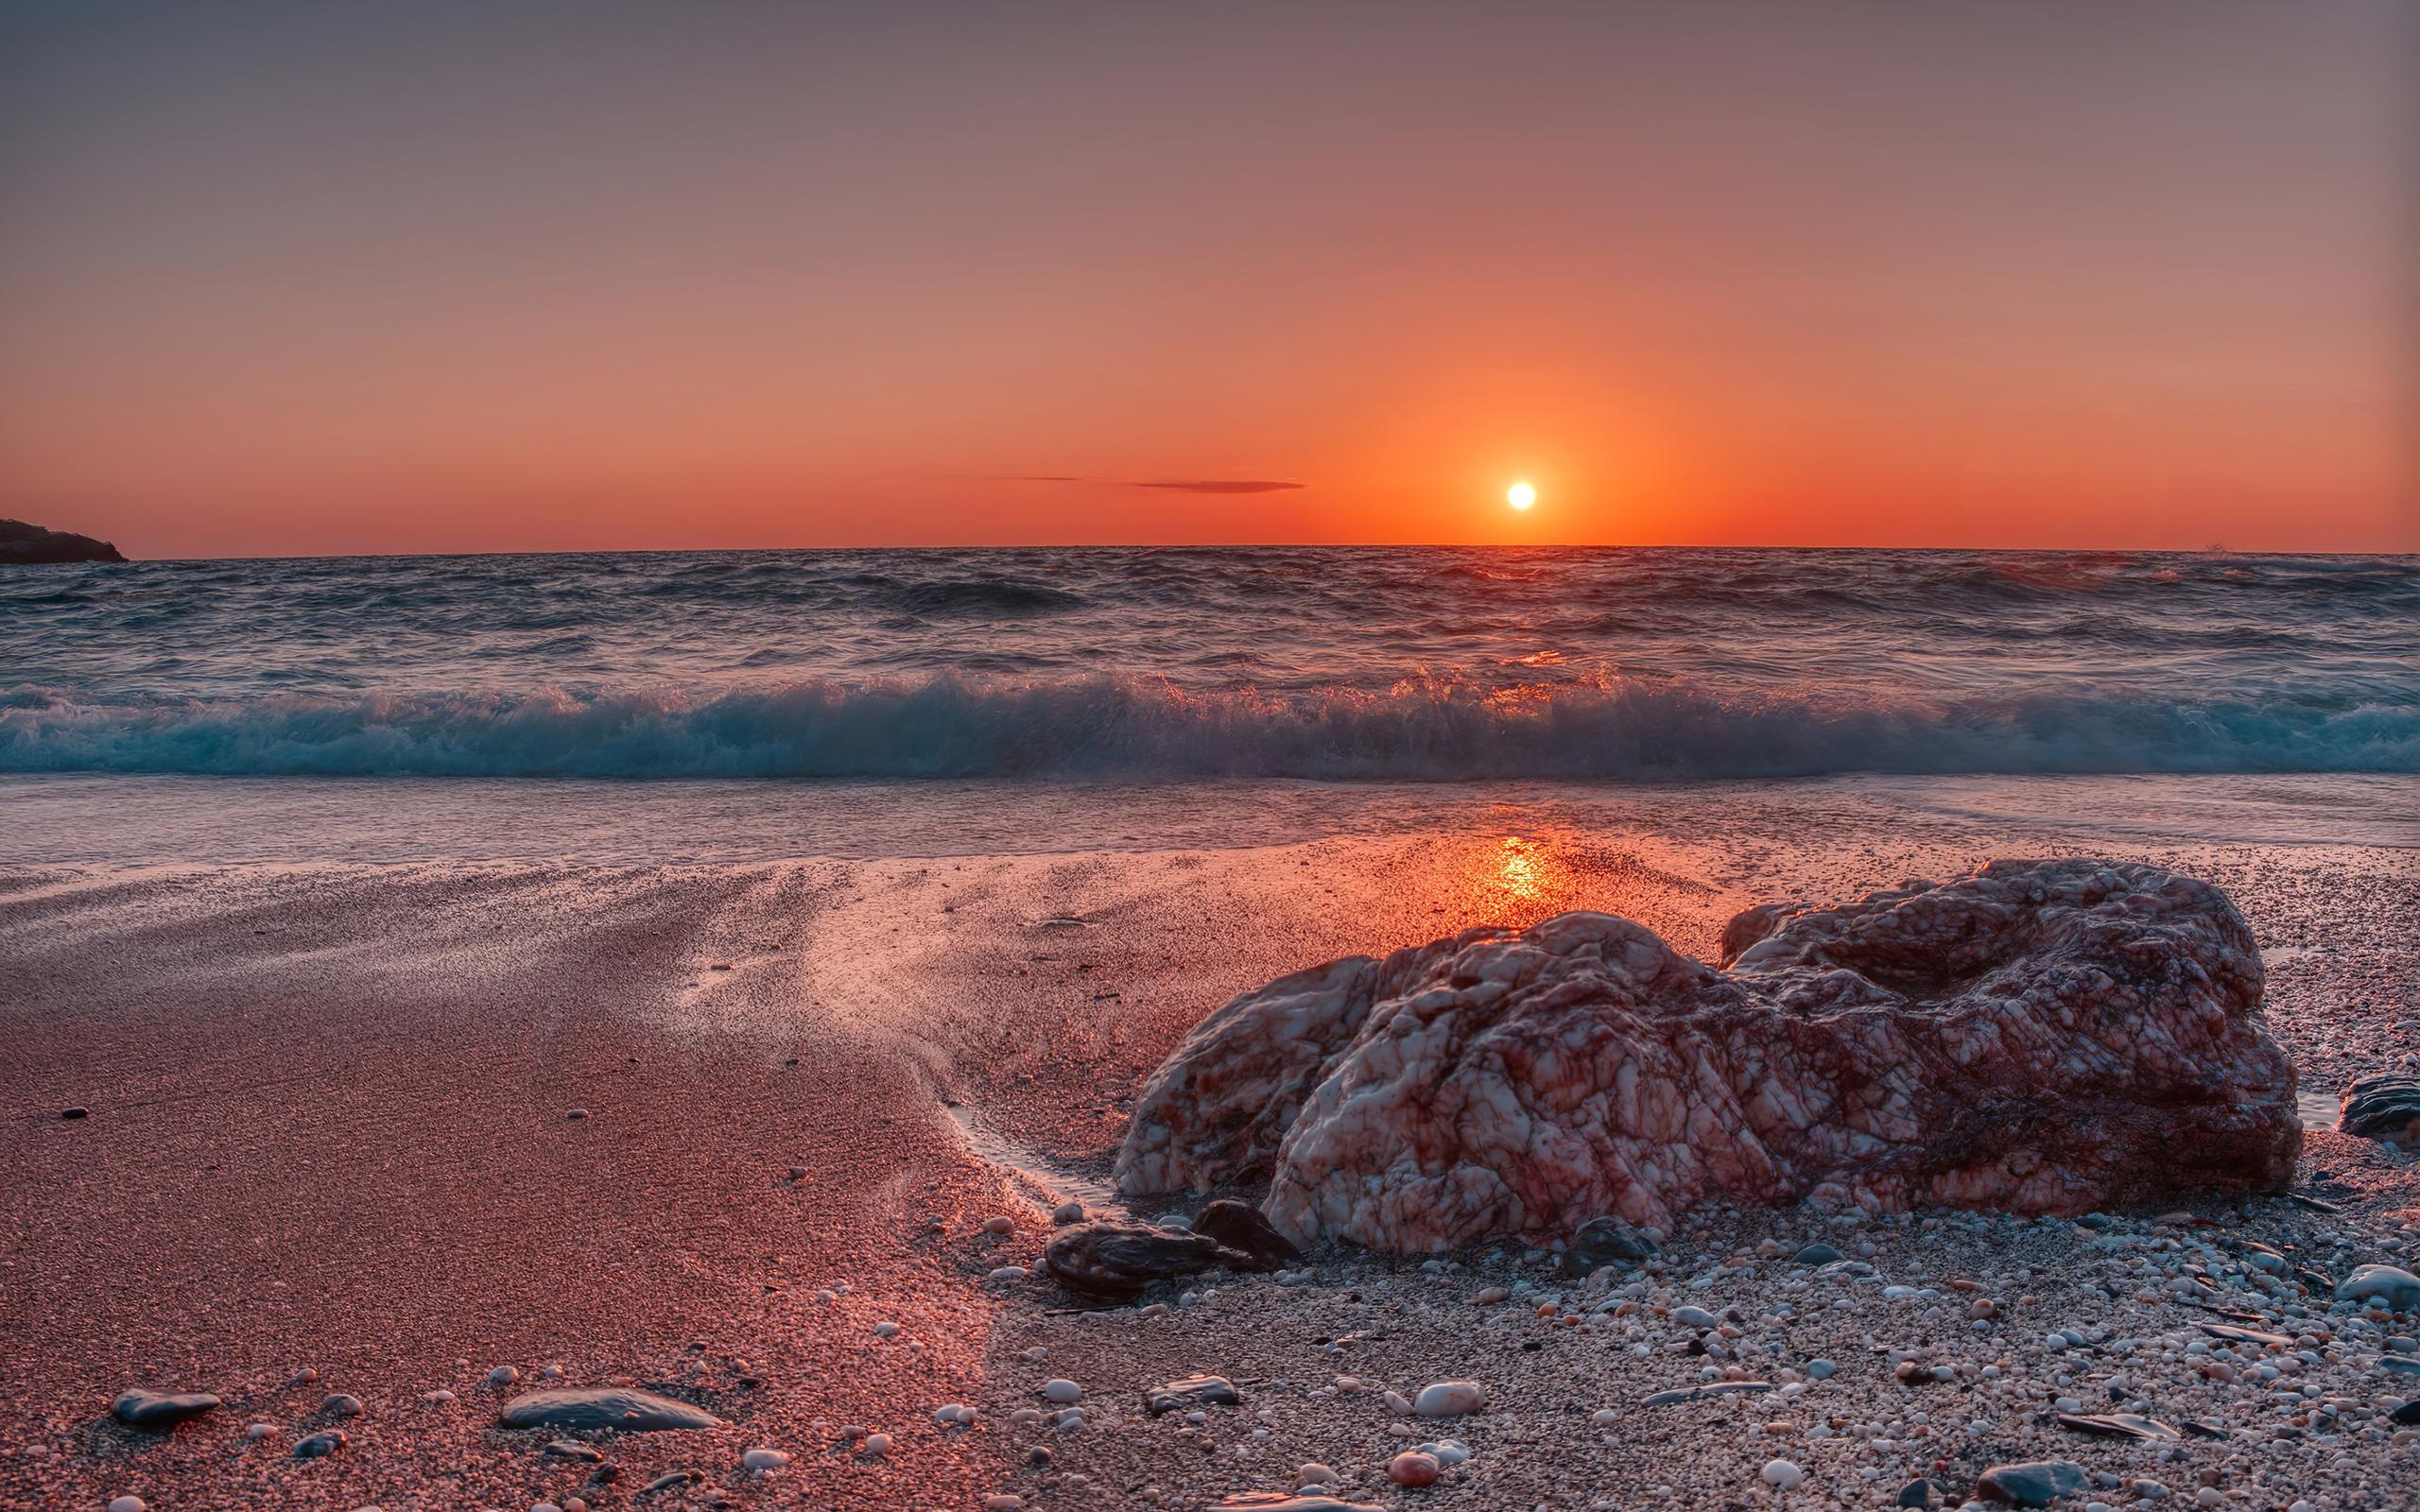 sea-beach-sunset-4k-e0.jpg